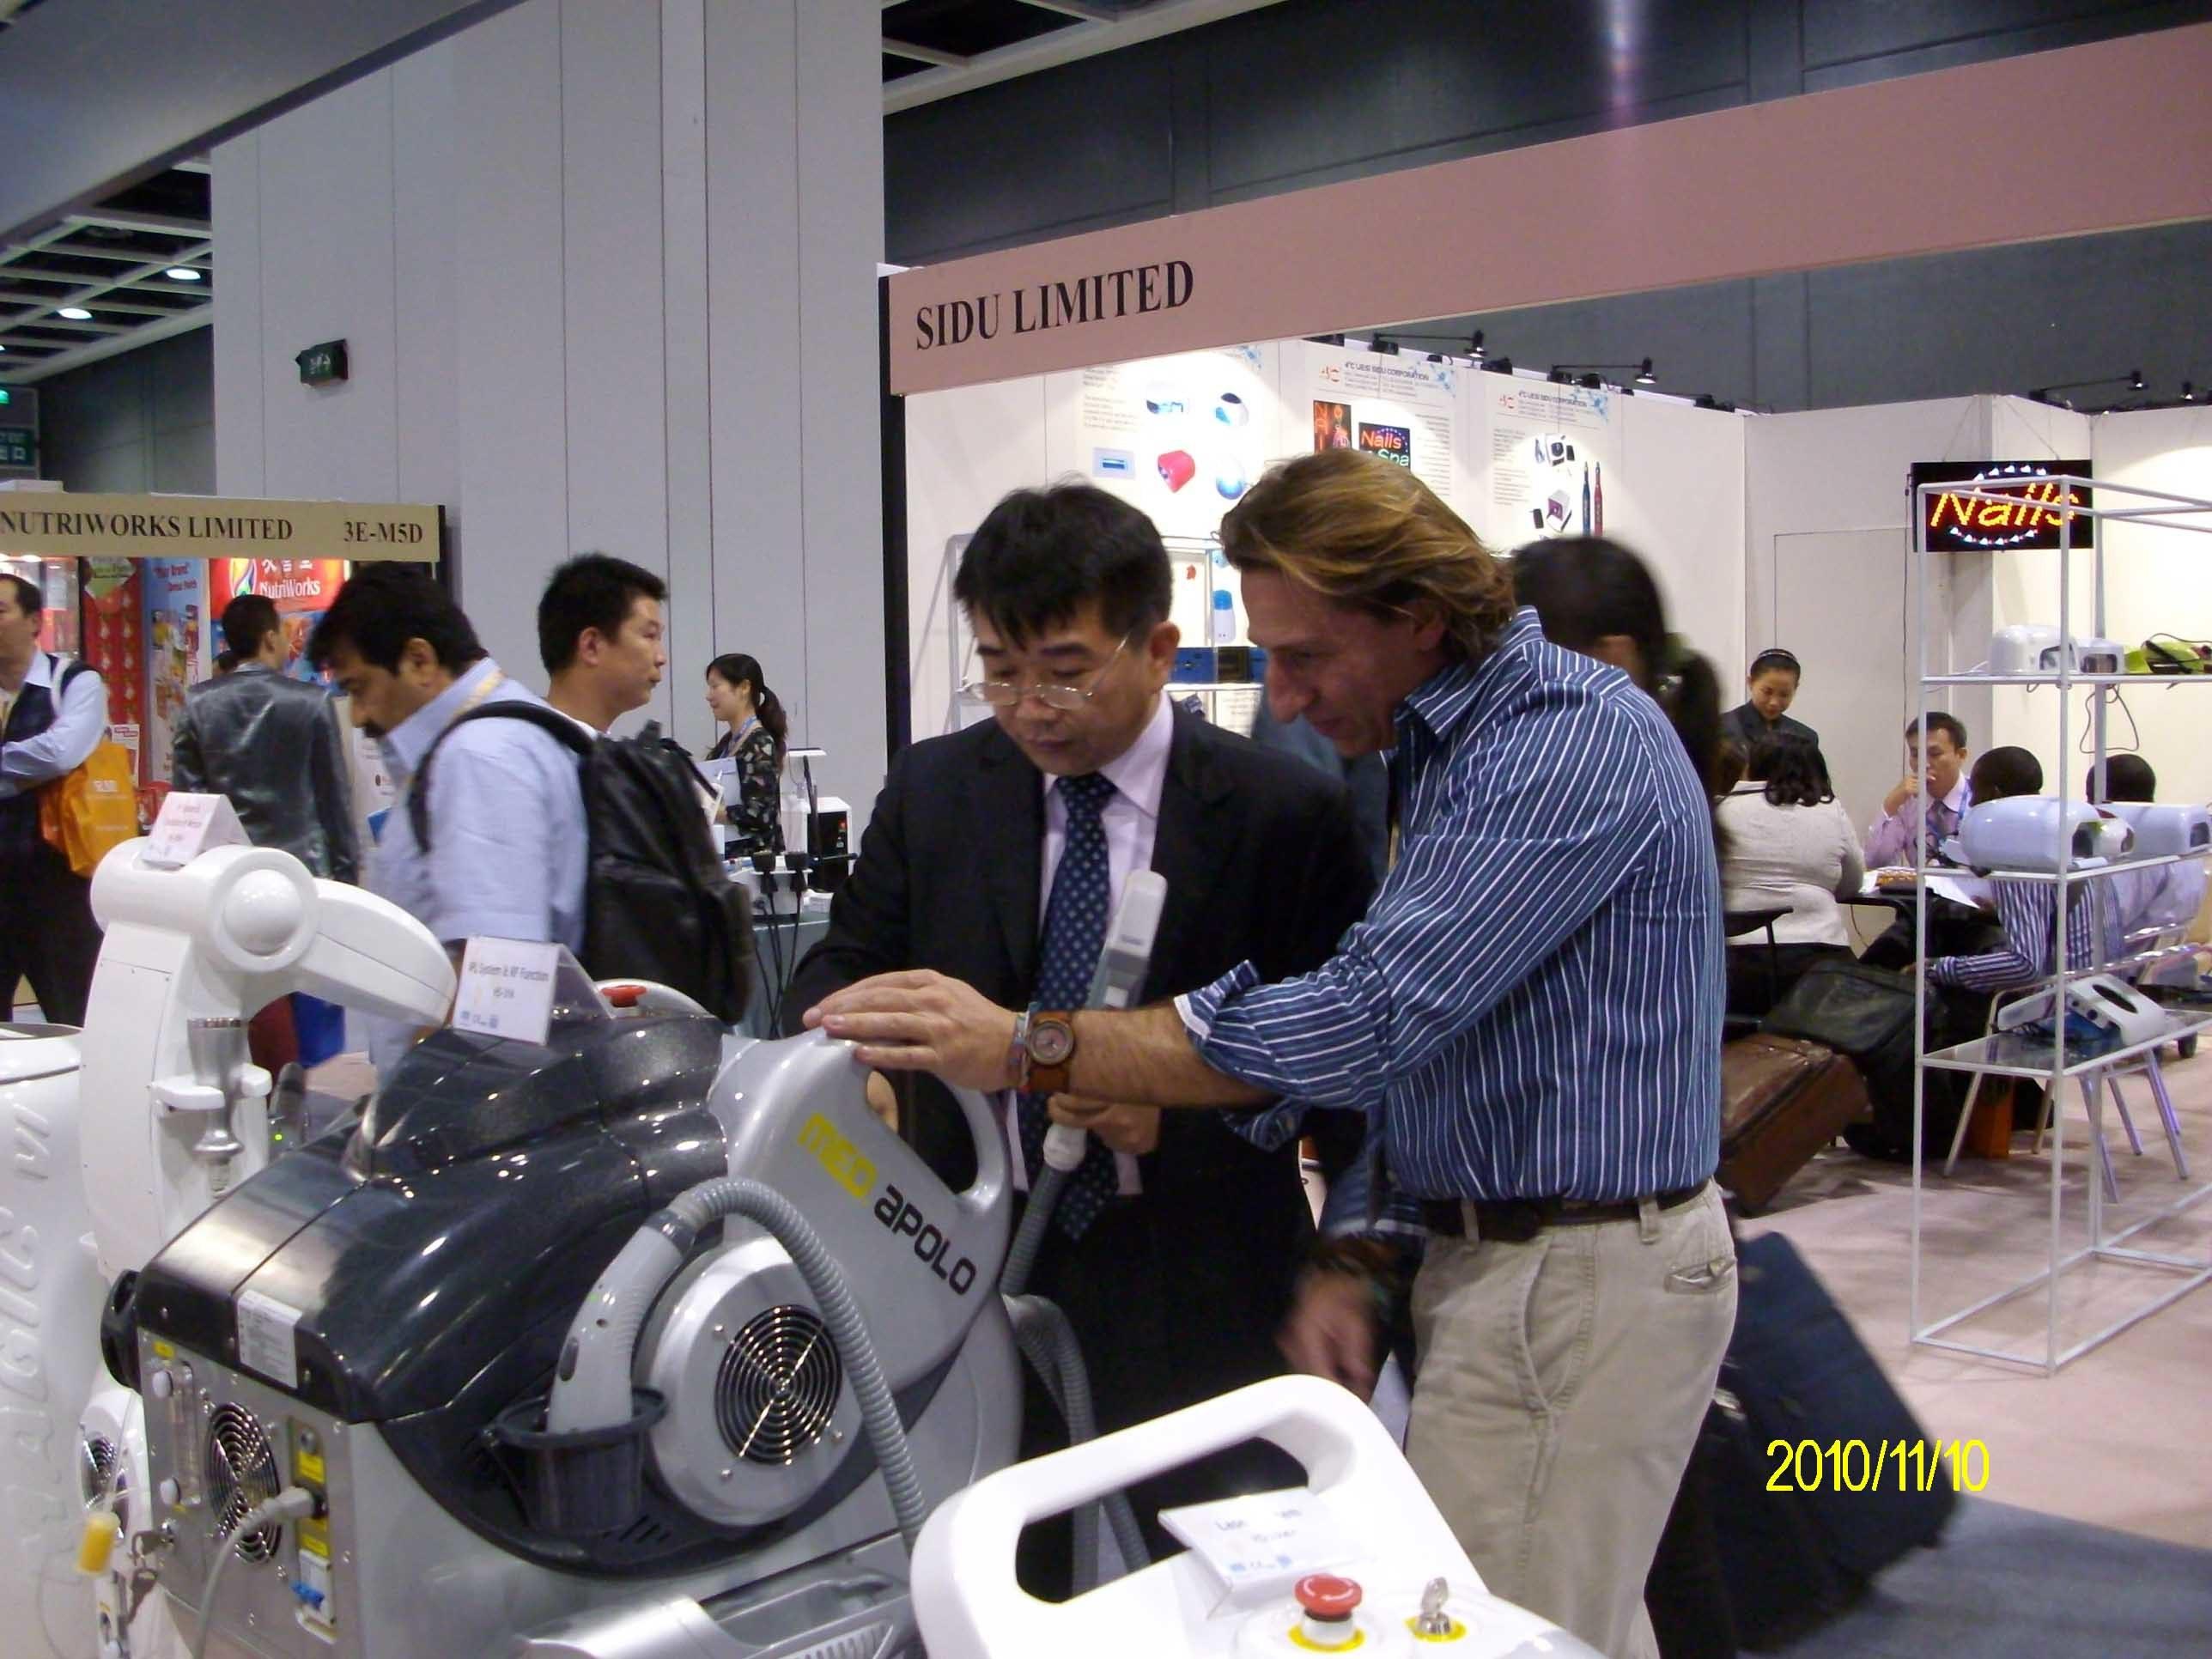 Apolo IPL+RF+E-Light Hair Remova Aesthetic Device